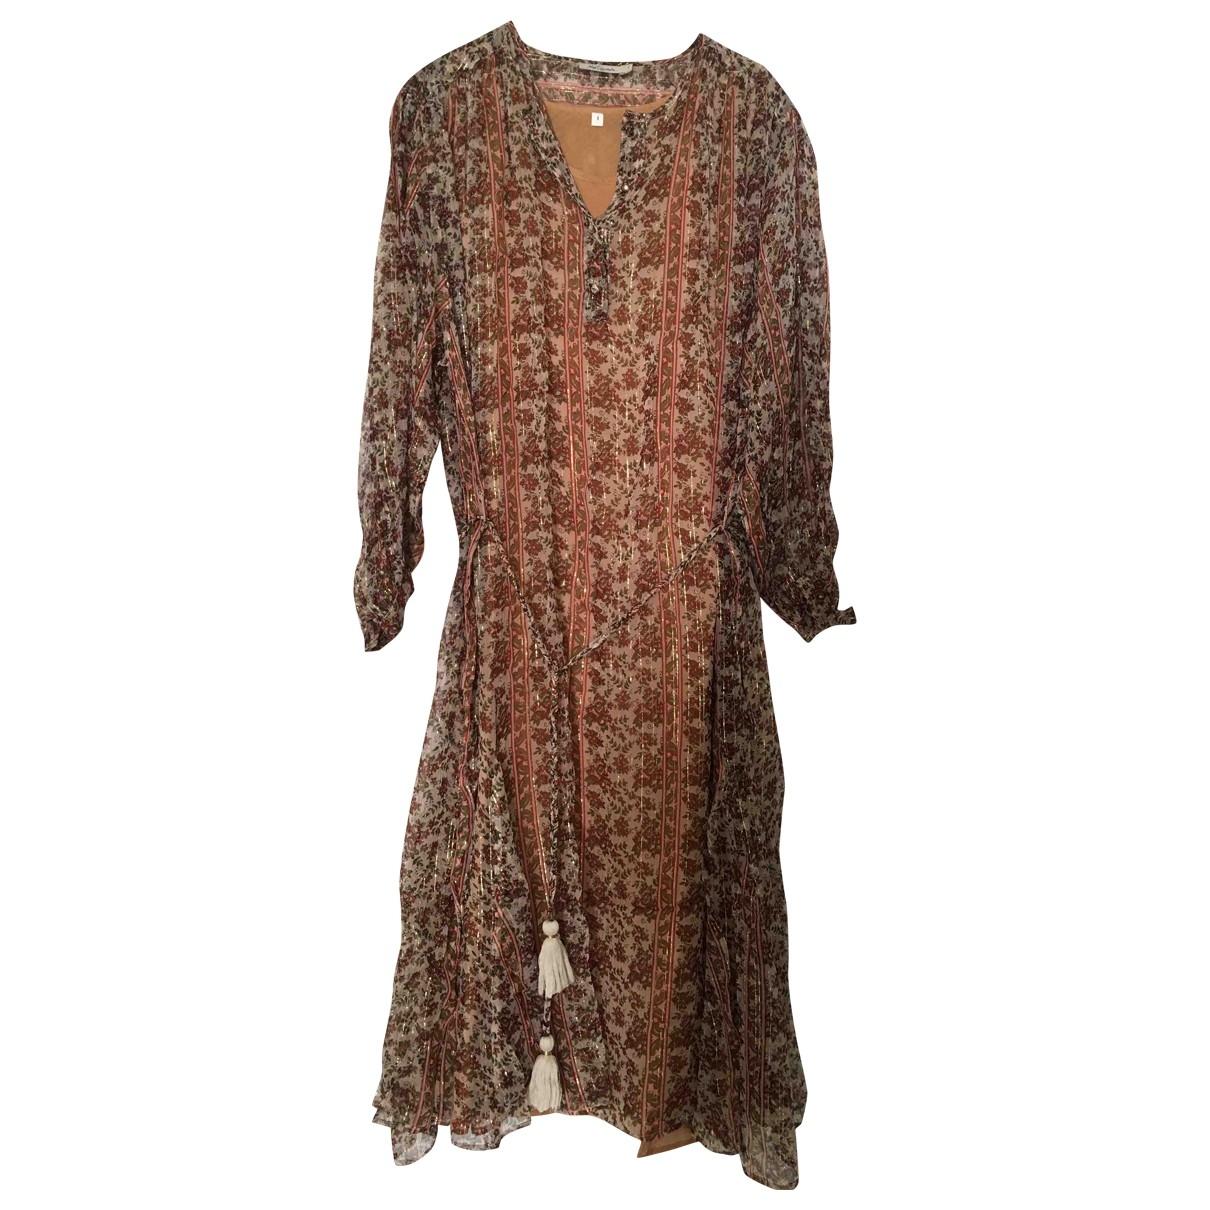 Mes Demoiselles ... \N dress for Women 1 0-5